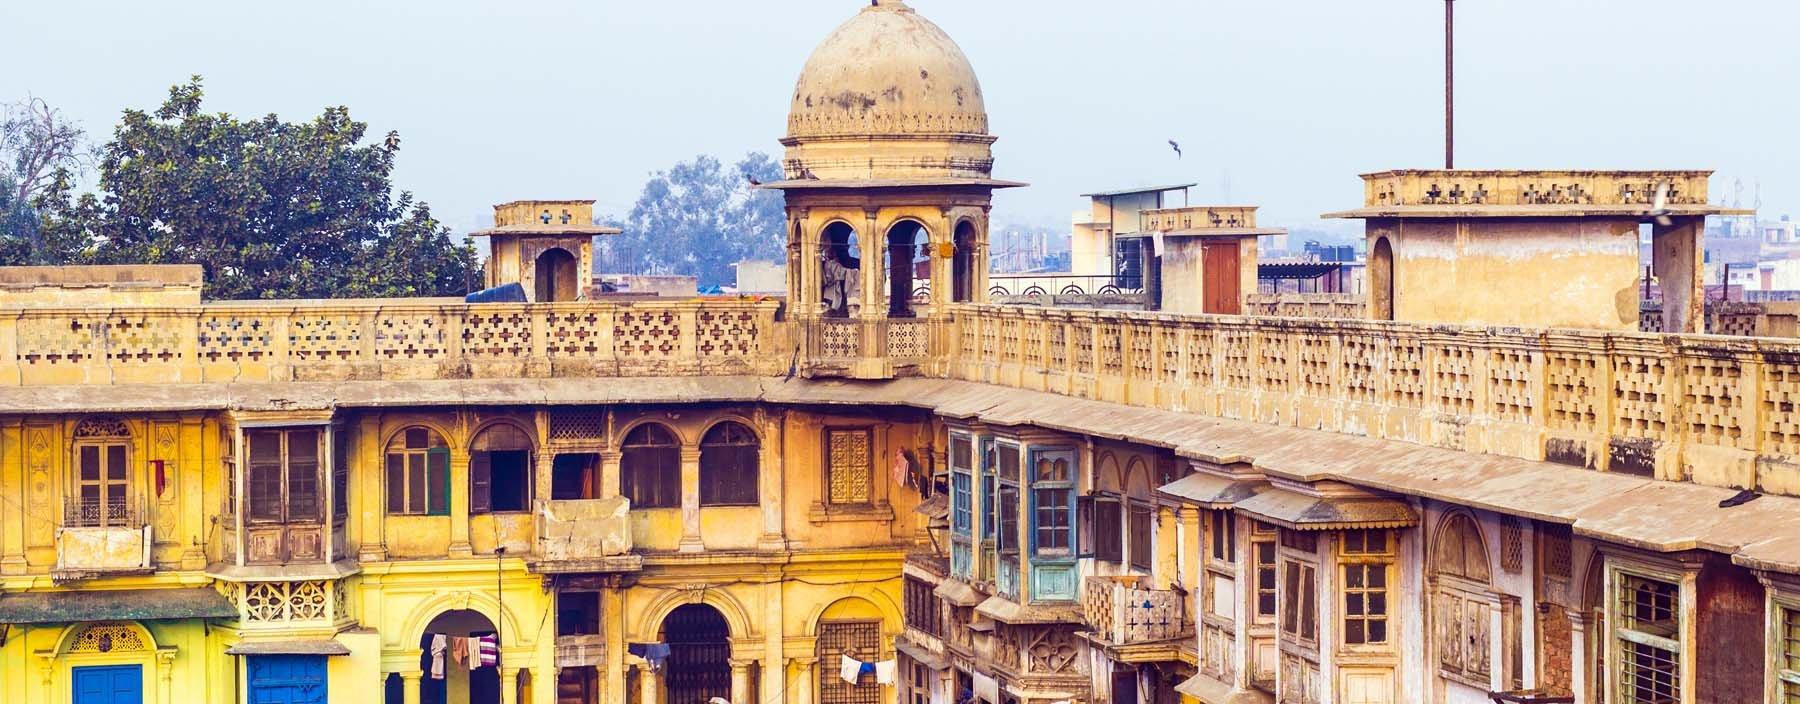 in, delhi, typical houses in old delhi.jpg